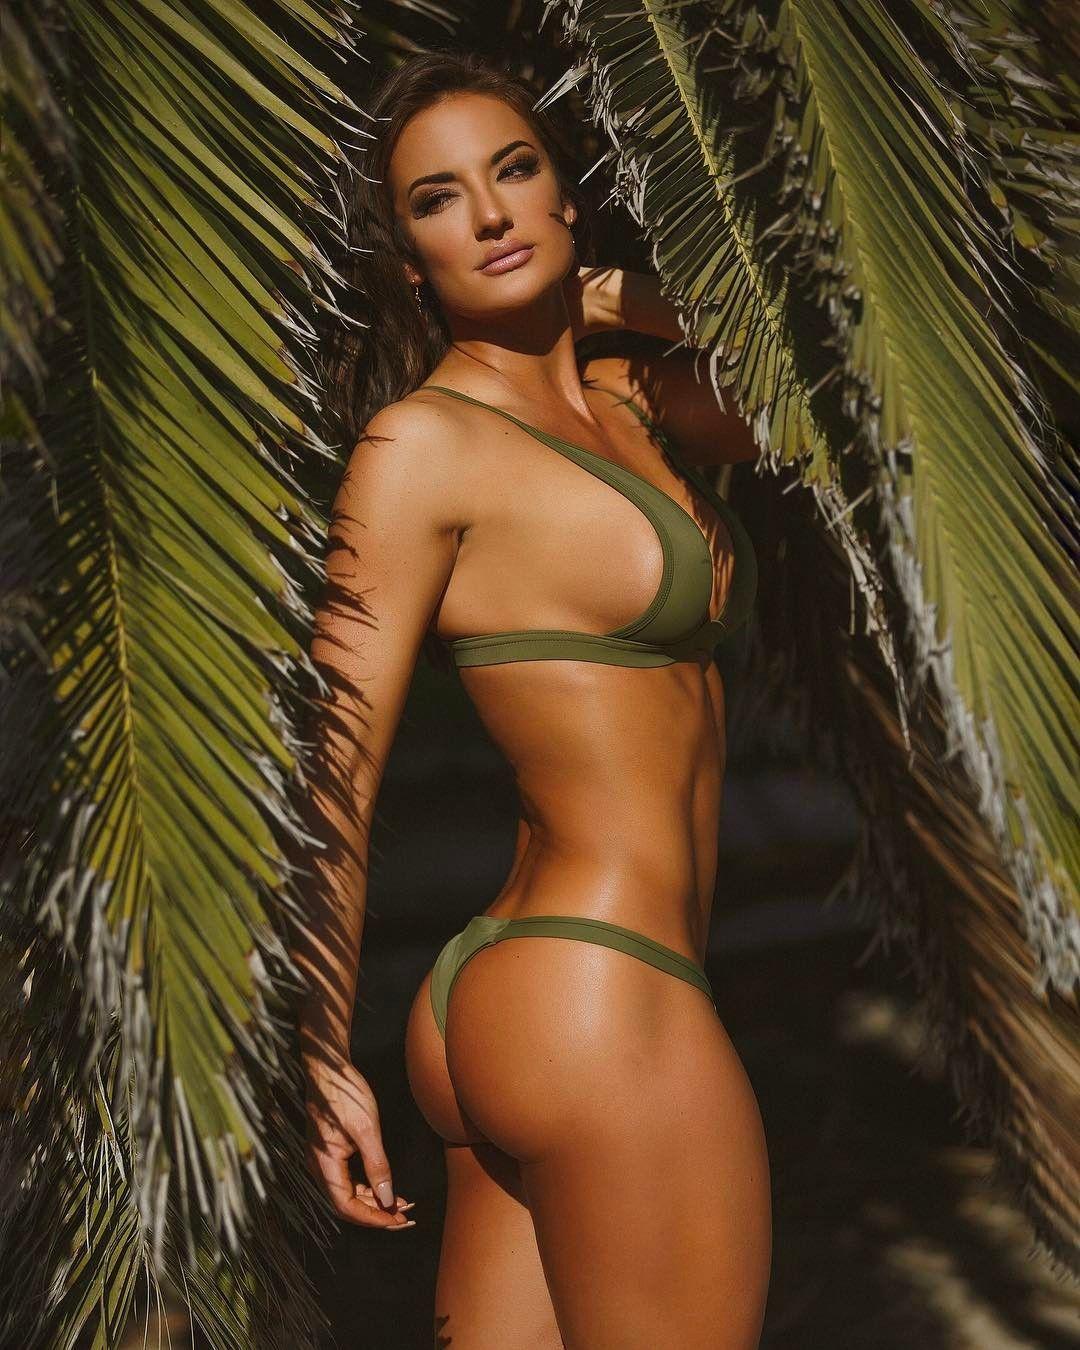 bikini-ass-models-roman-orgy-sex-slaves-film-movie